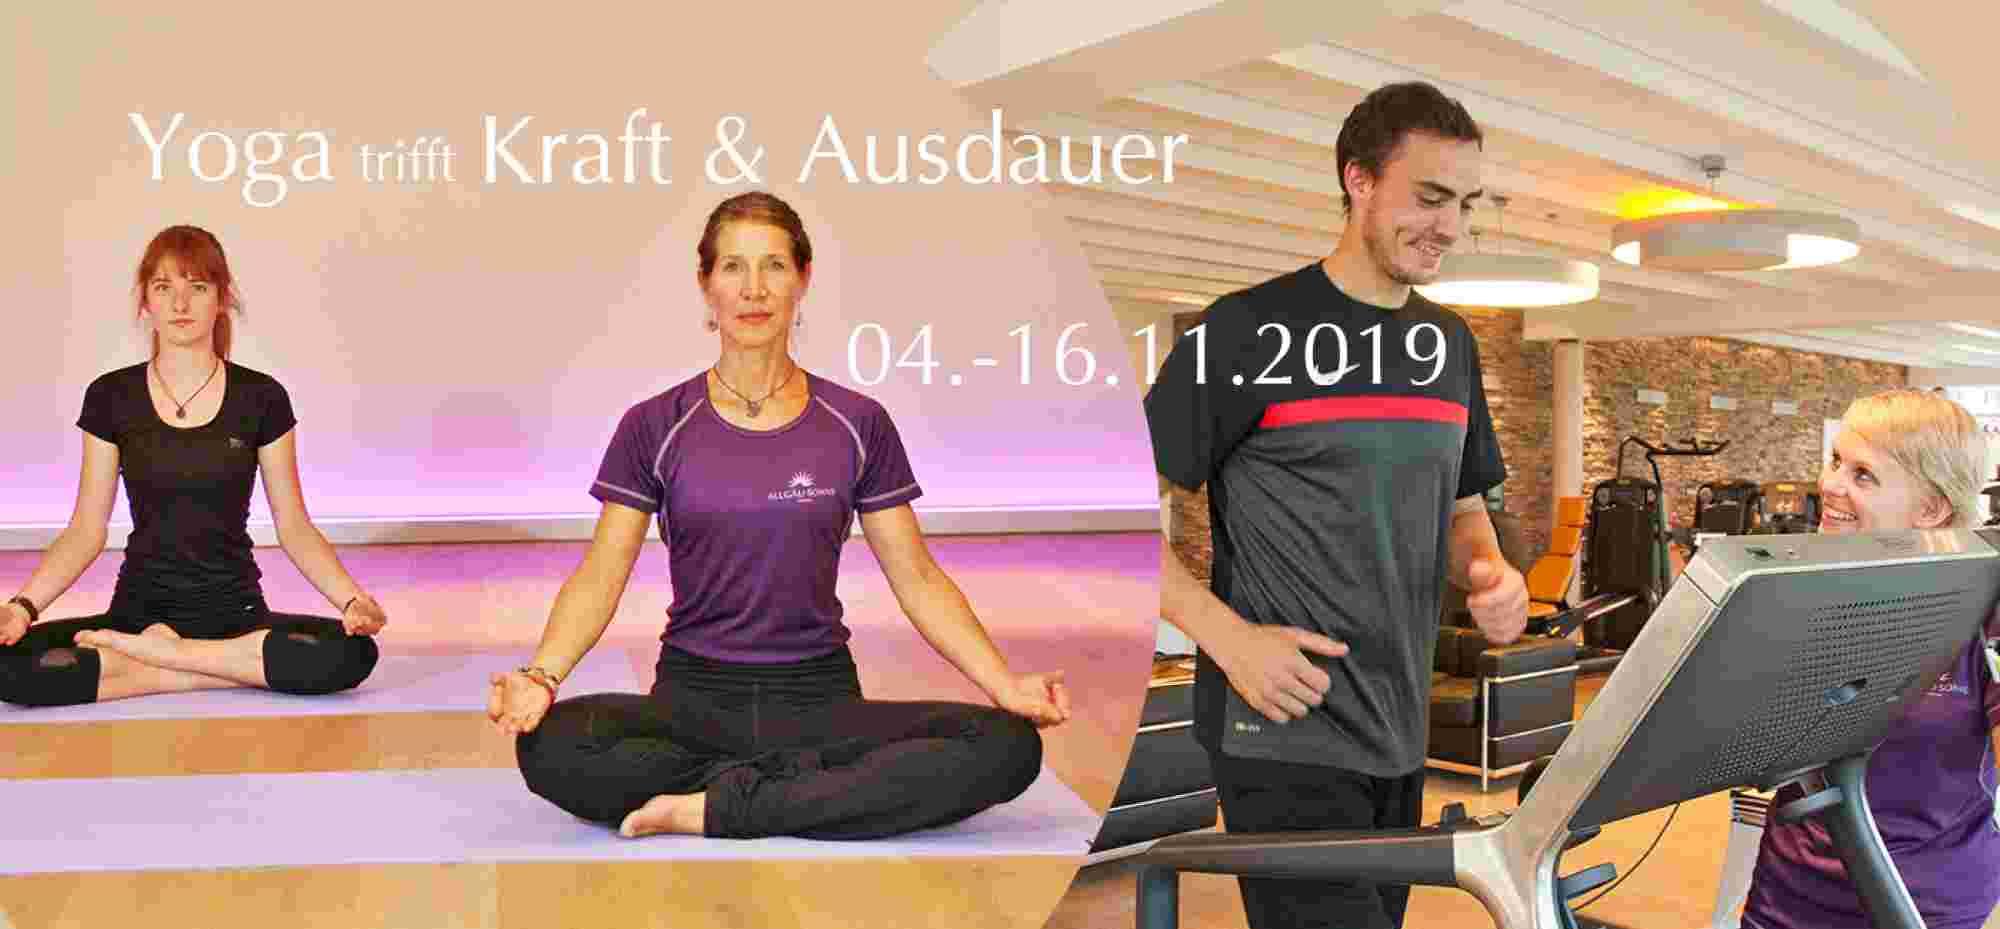 Yoga trifft Kraft & Ausdauer